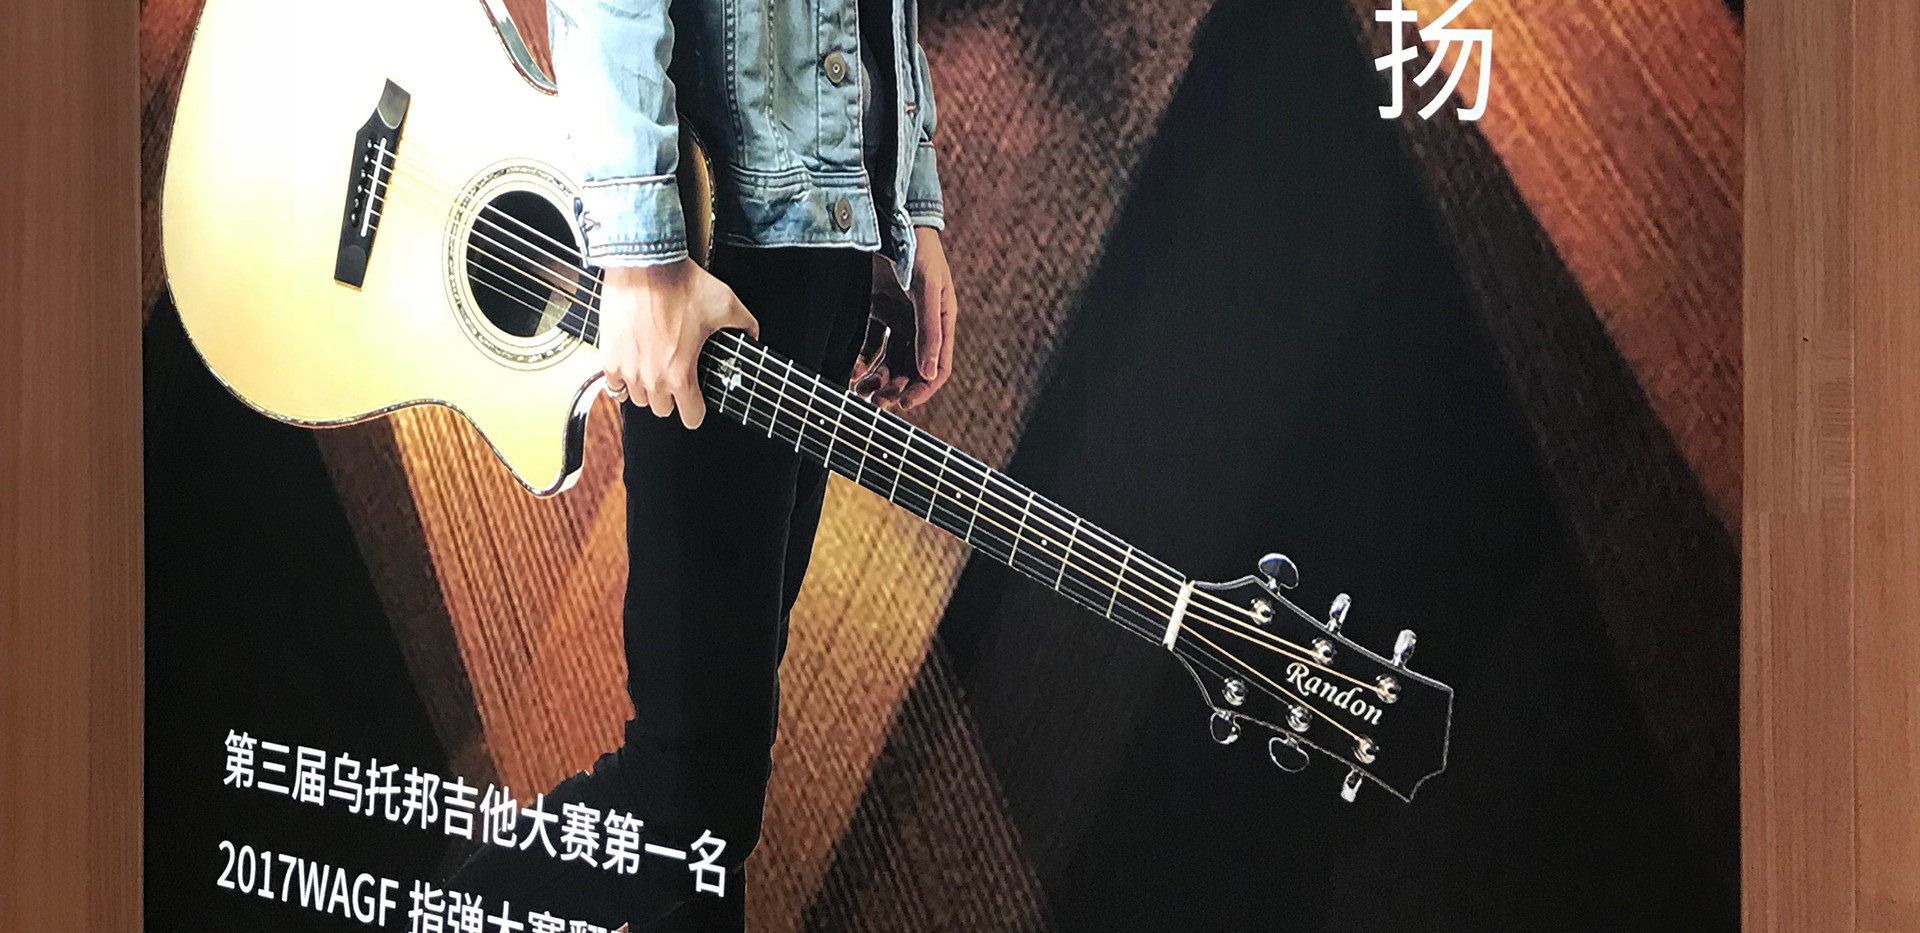 2018beijing07.jpg